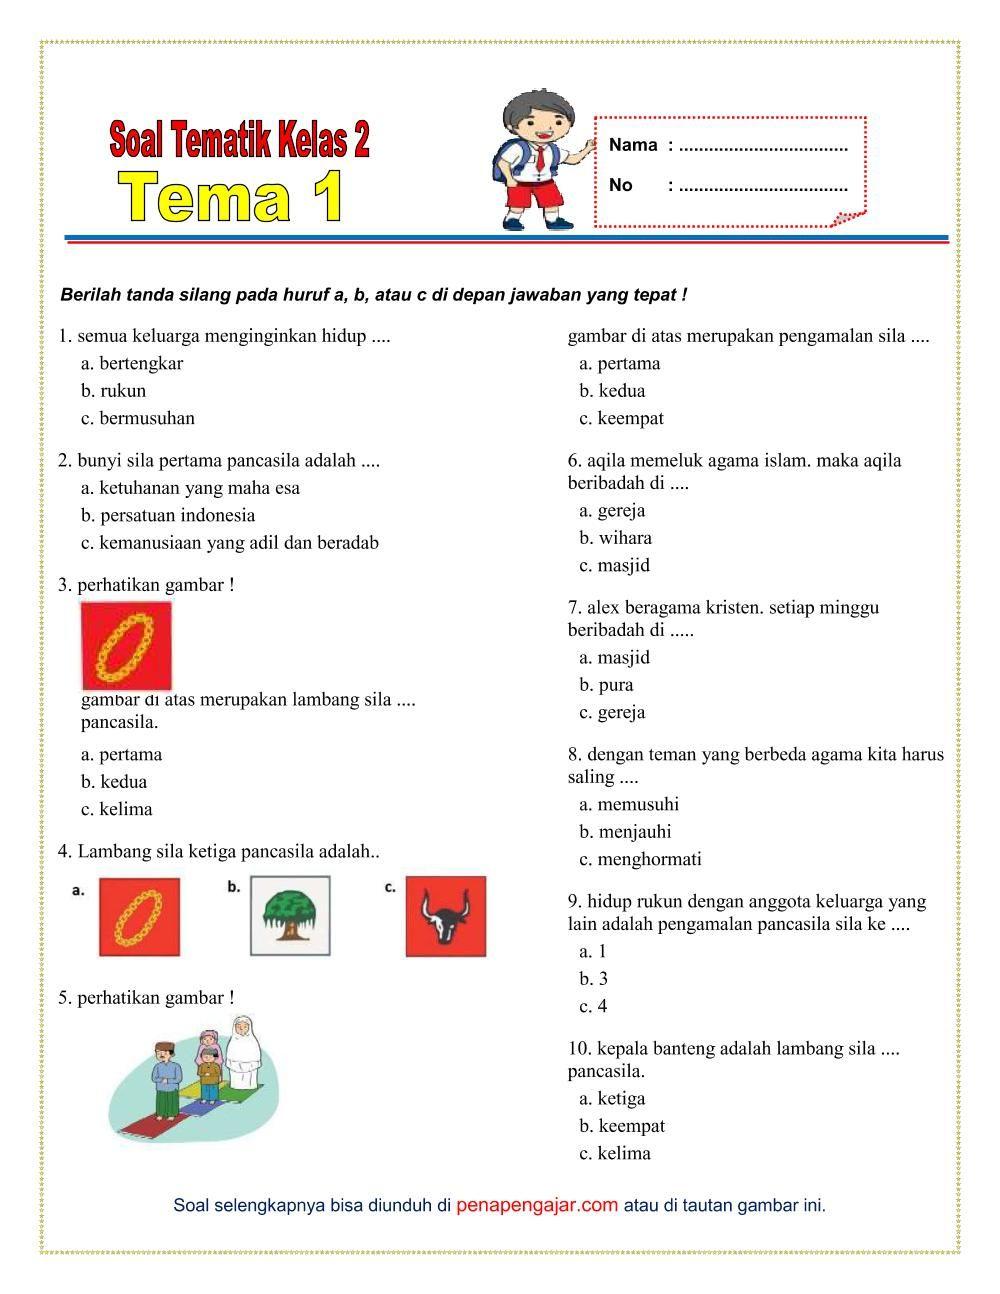 Download Soal Uas Pjok Kelas 6 Semester 1 Kurikulum 2013